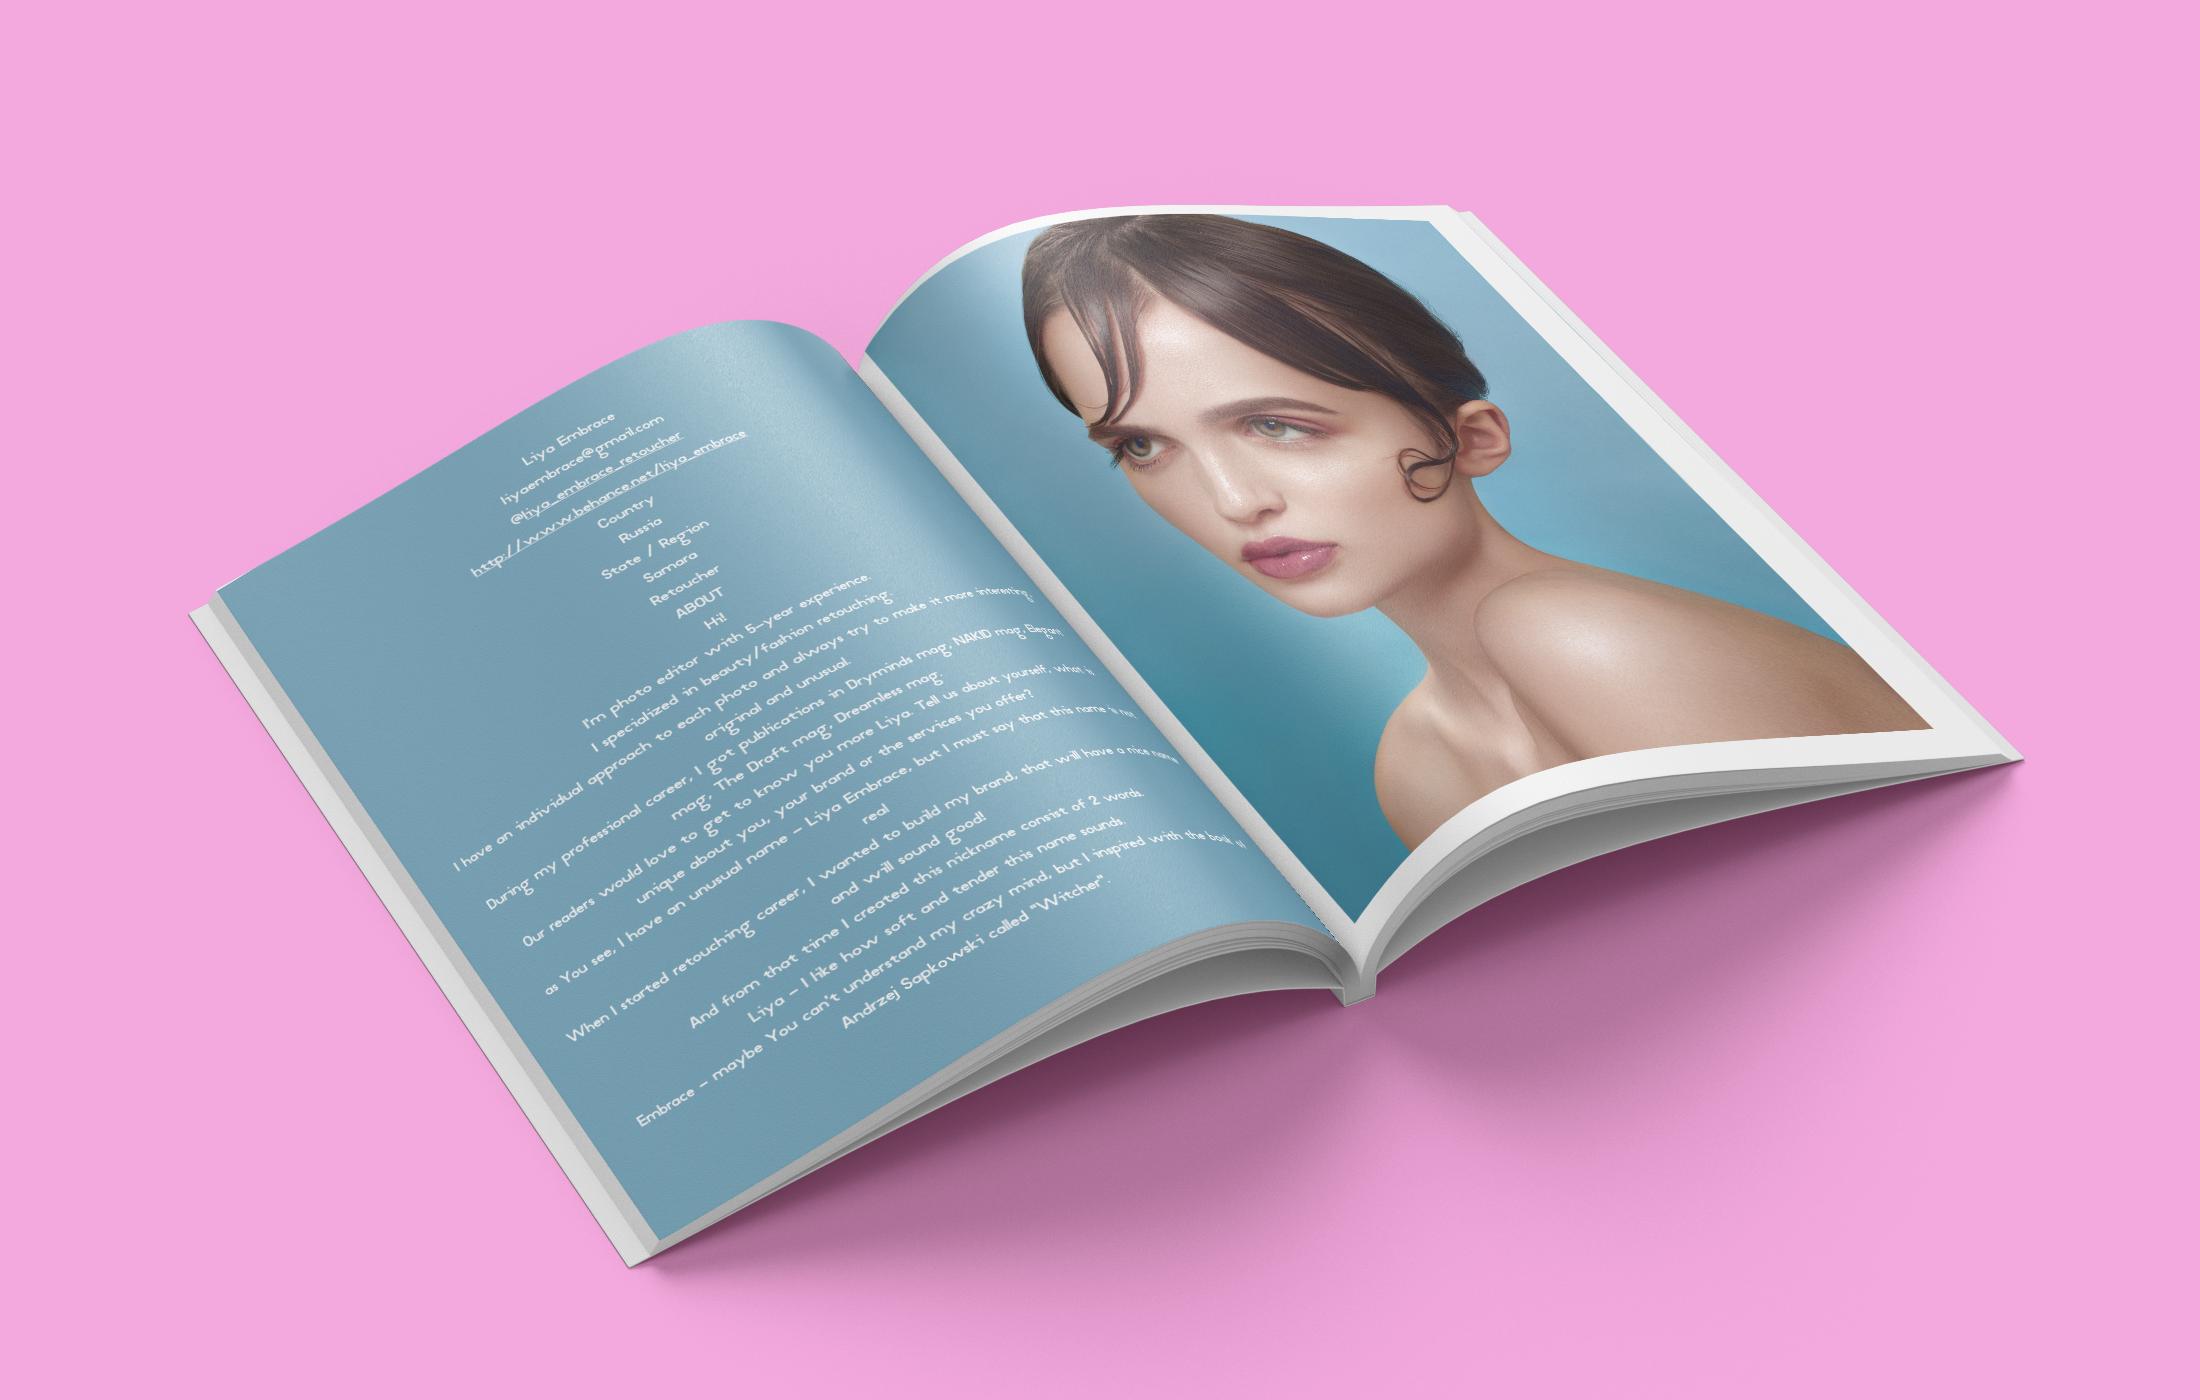 Model Citizen Magazine Issue 38, Macky Suson, Fashion Inclusion Now2.png